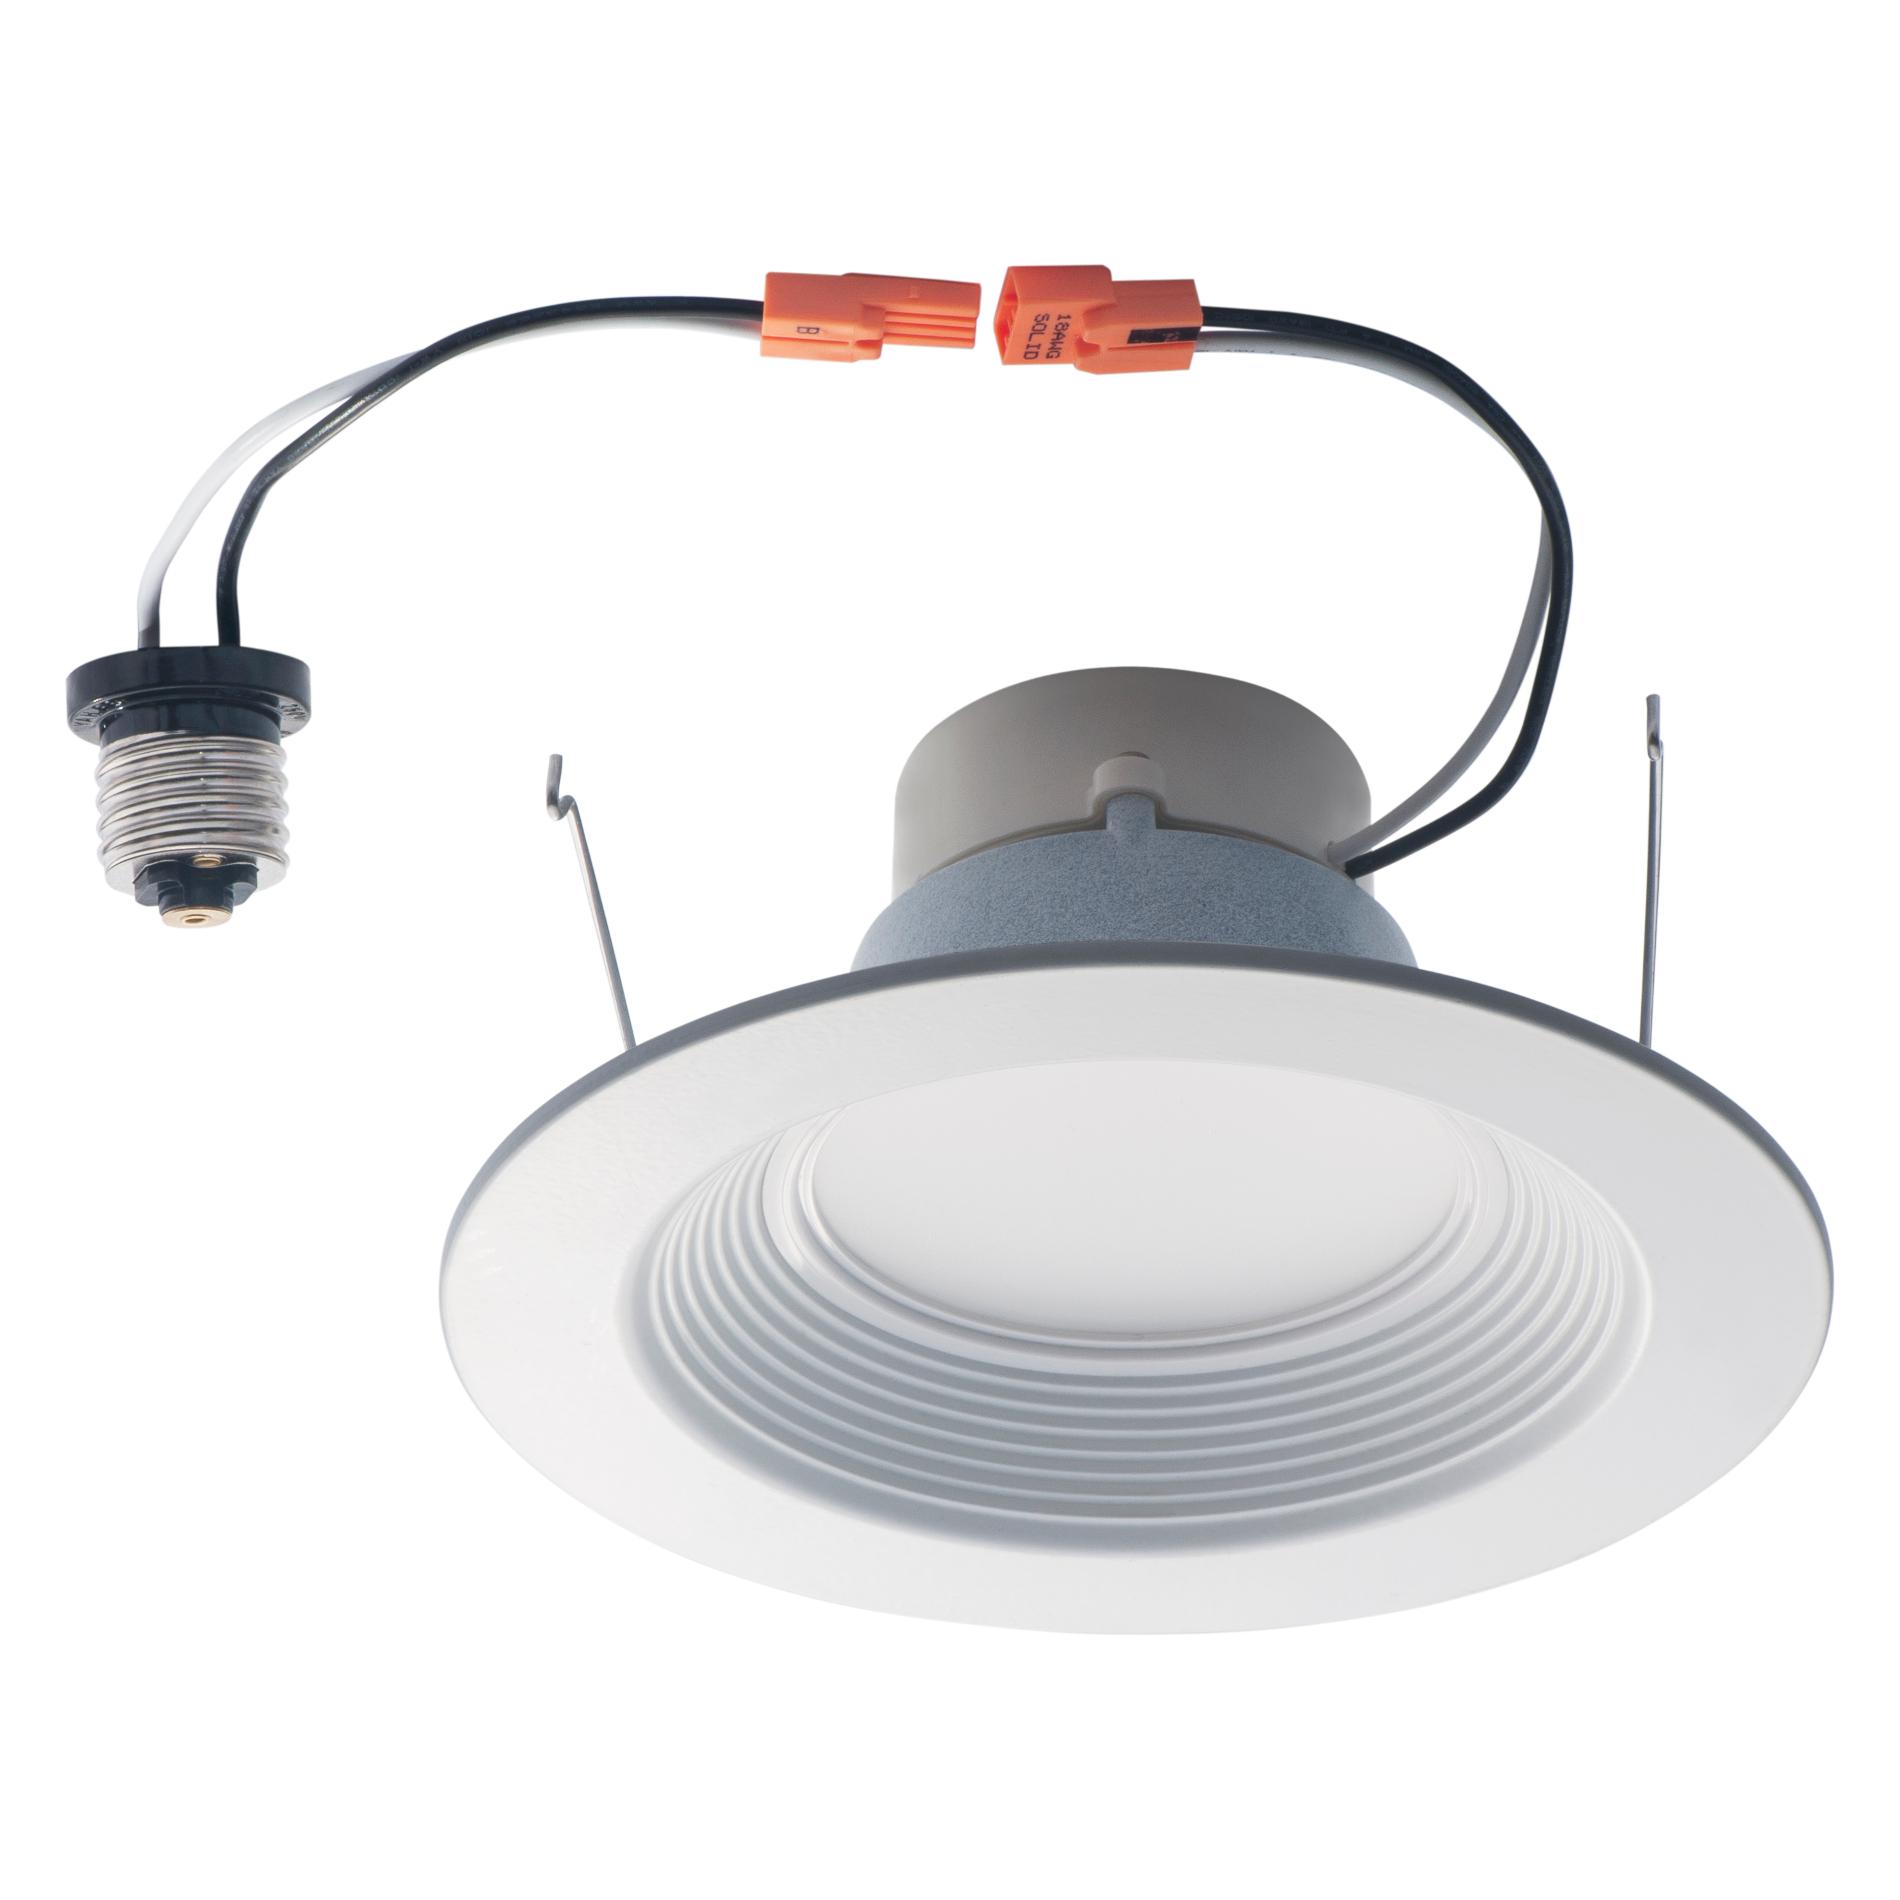 LED 6 Inch Down Light Retrofit AC110 15W 5000K – A for Downlight Led Png  35fsj